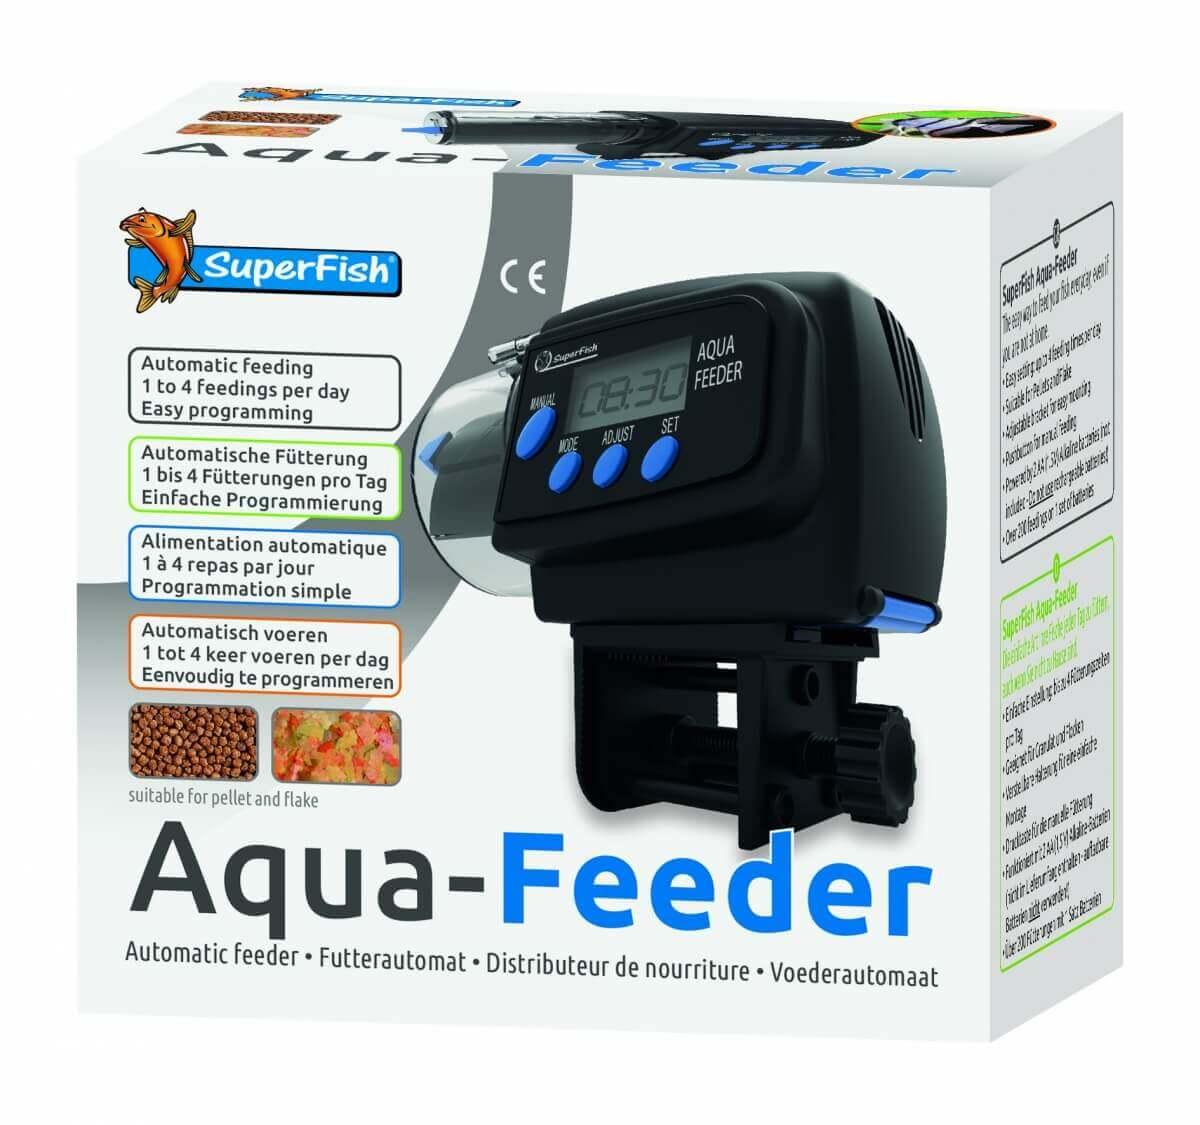 SuperFish Aqua-Feeder Distributeur automatique de nourriture_0